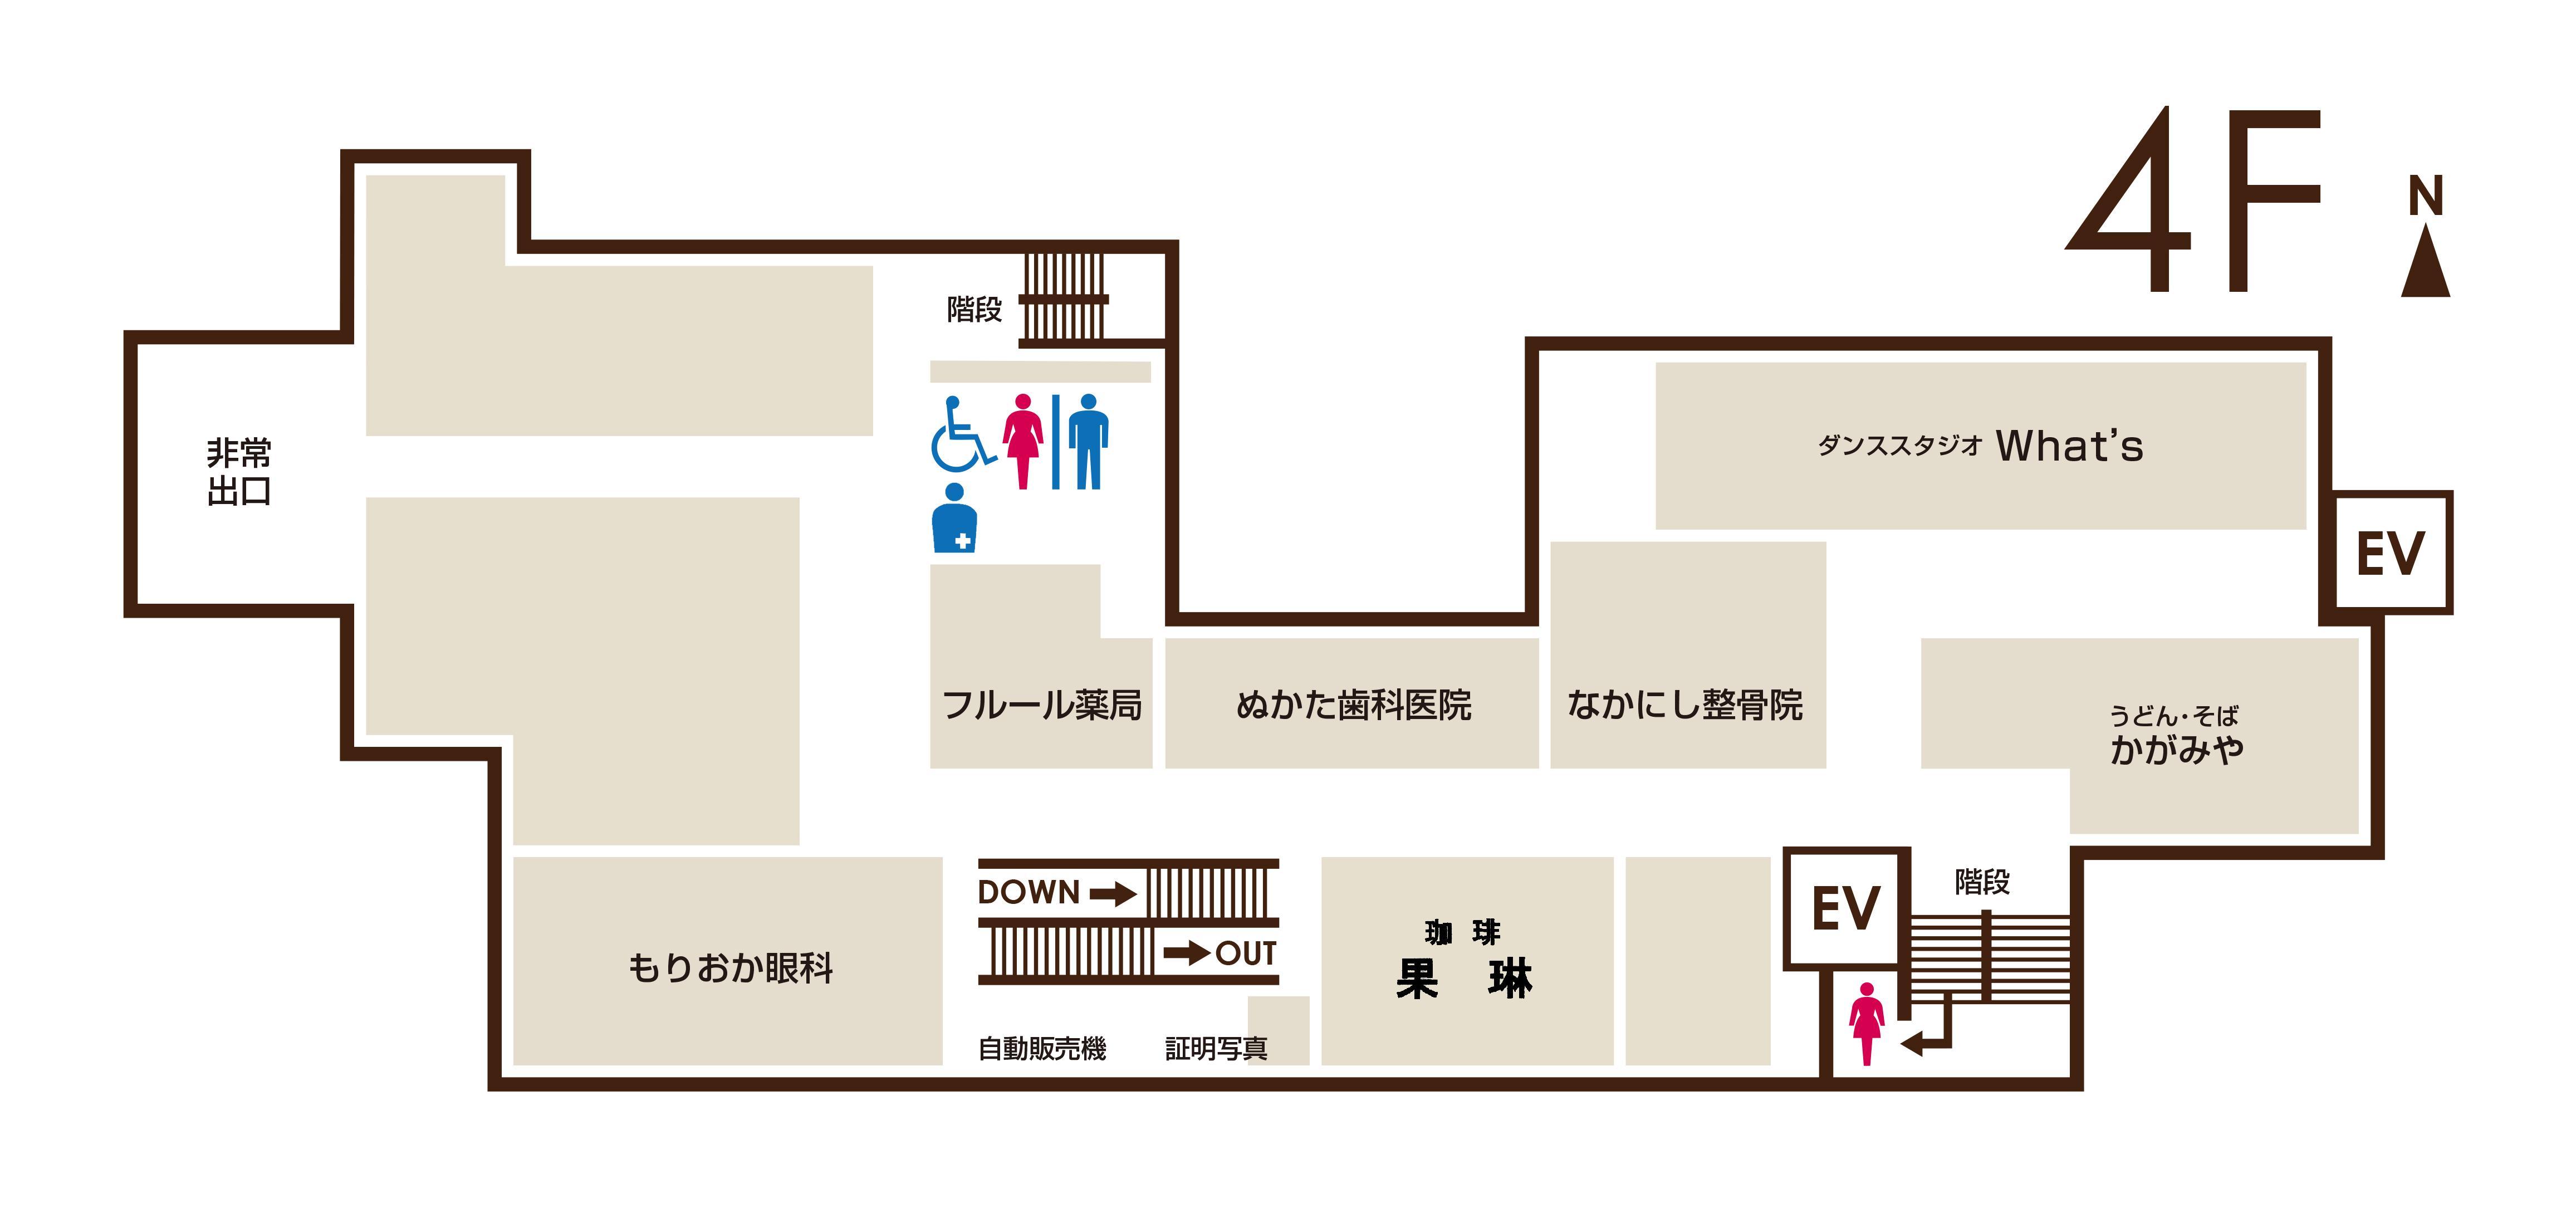 2017_3_6_SUNPATIO_WEB_MAP